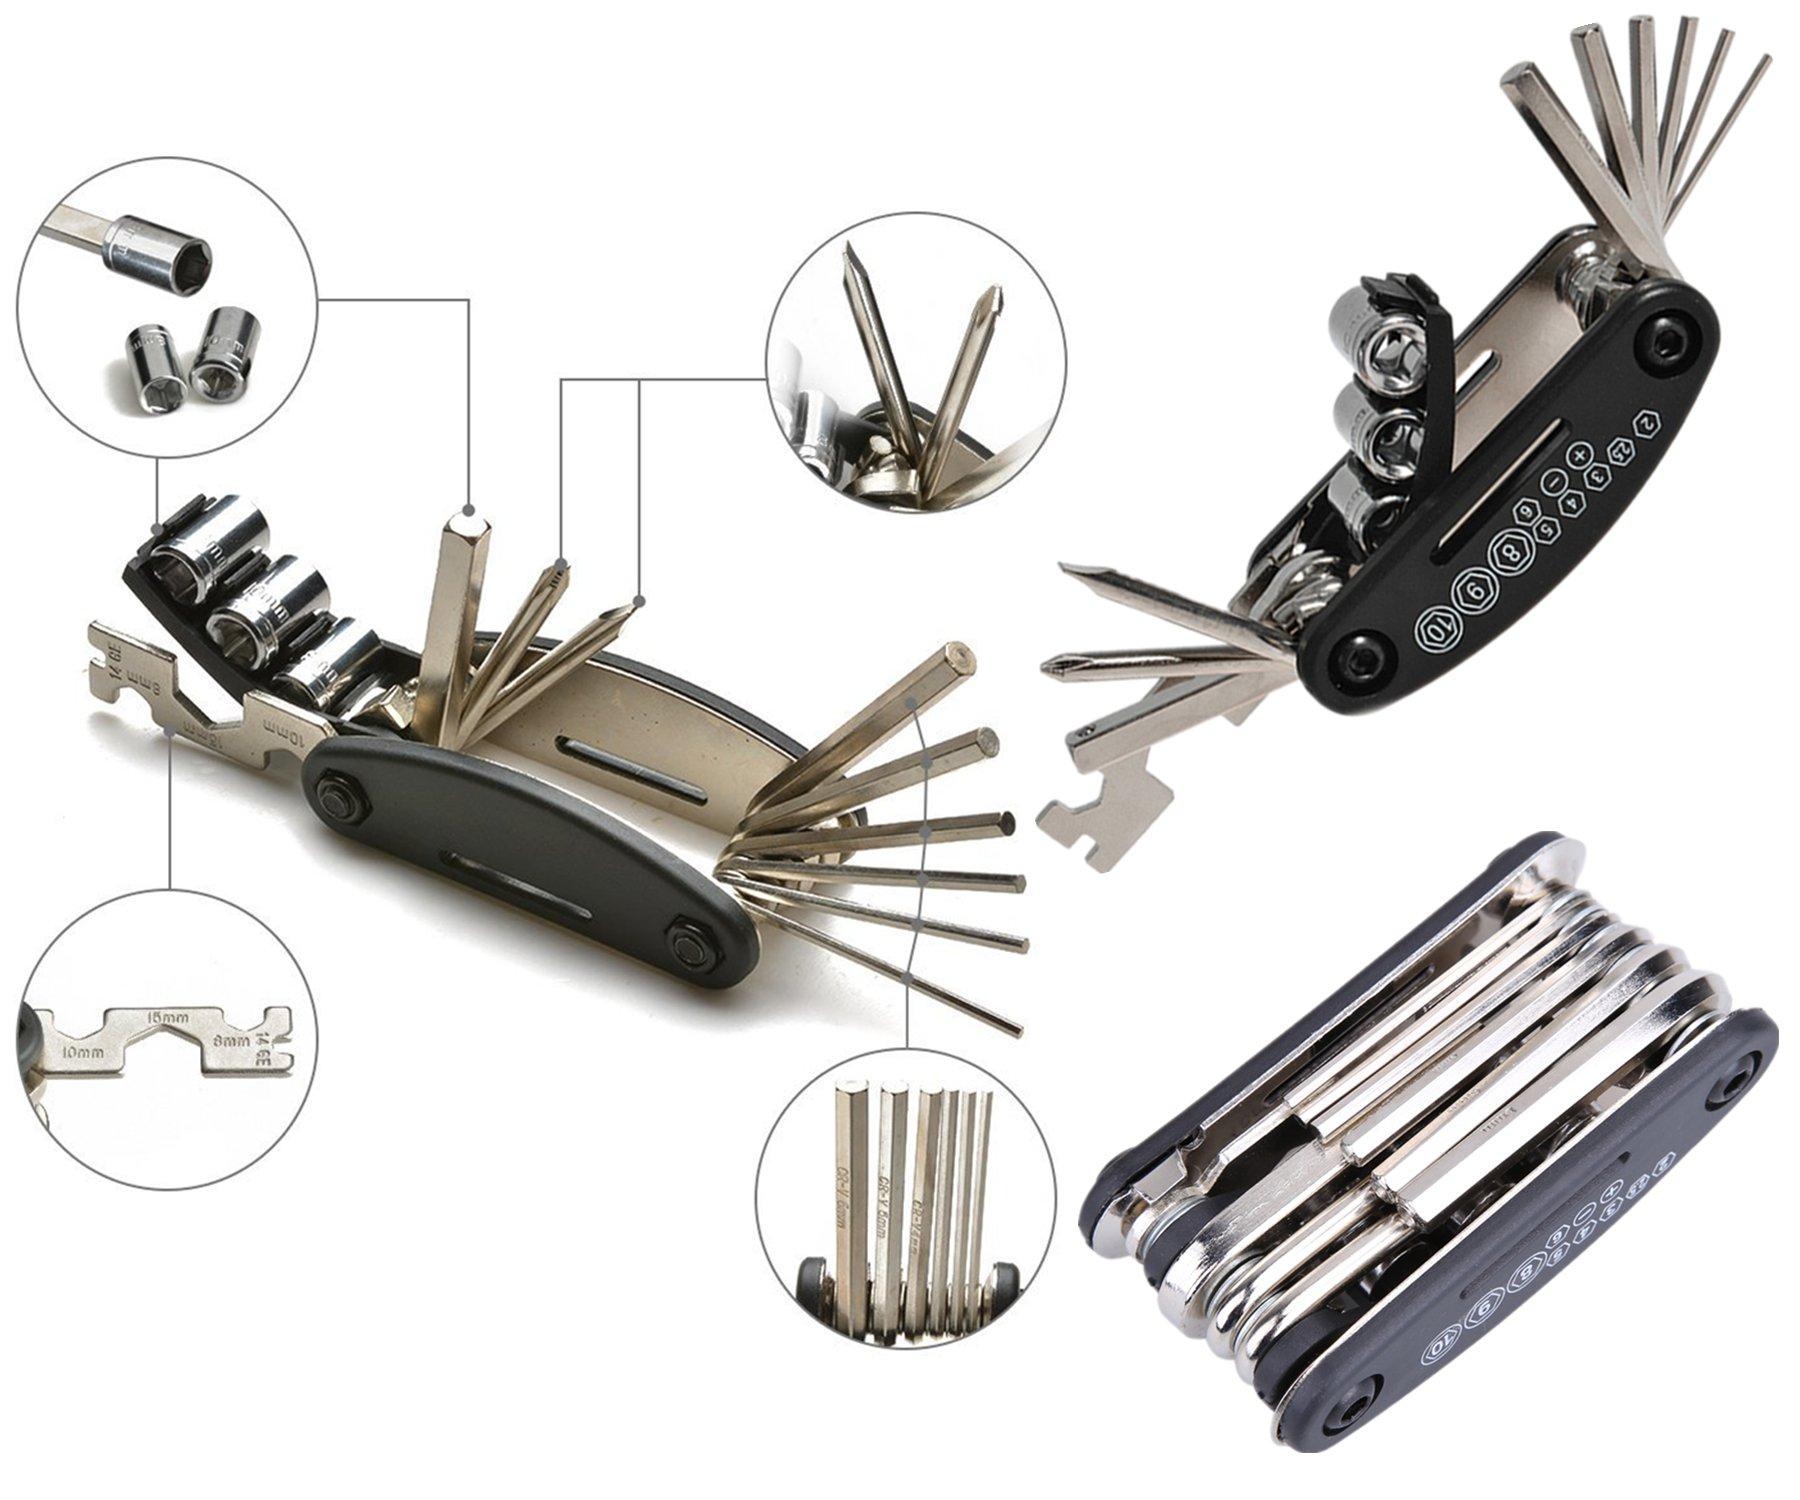 Bicycle repair kit, bicycle tool kit,bicycle tools,bicycle tool bag with tools,bicycle tool repair kit,tools for bicycles,bicycle tool kit with bag by bicycle kits (Image #2)